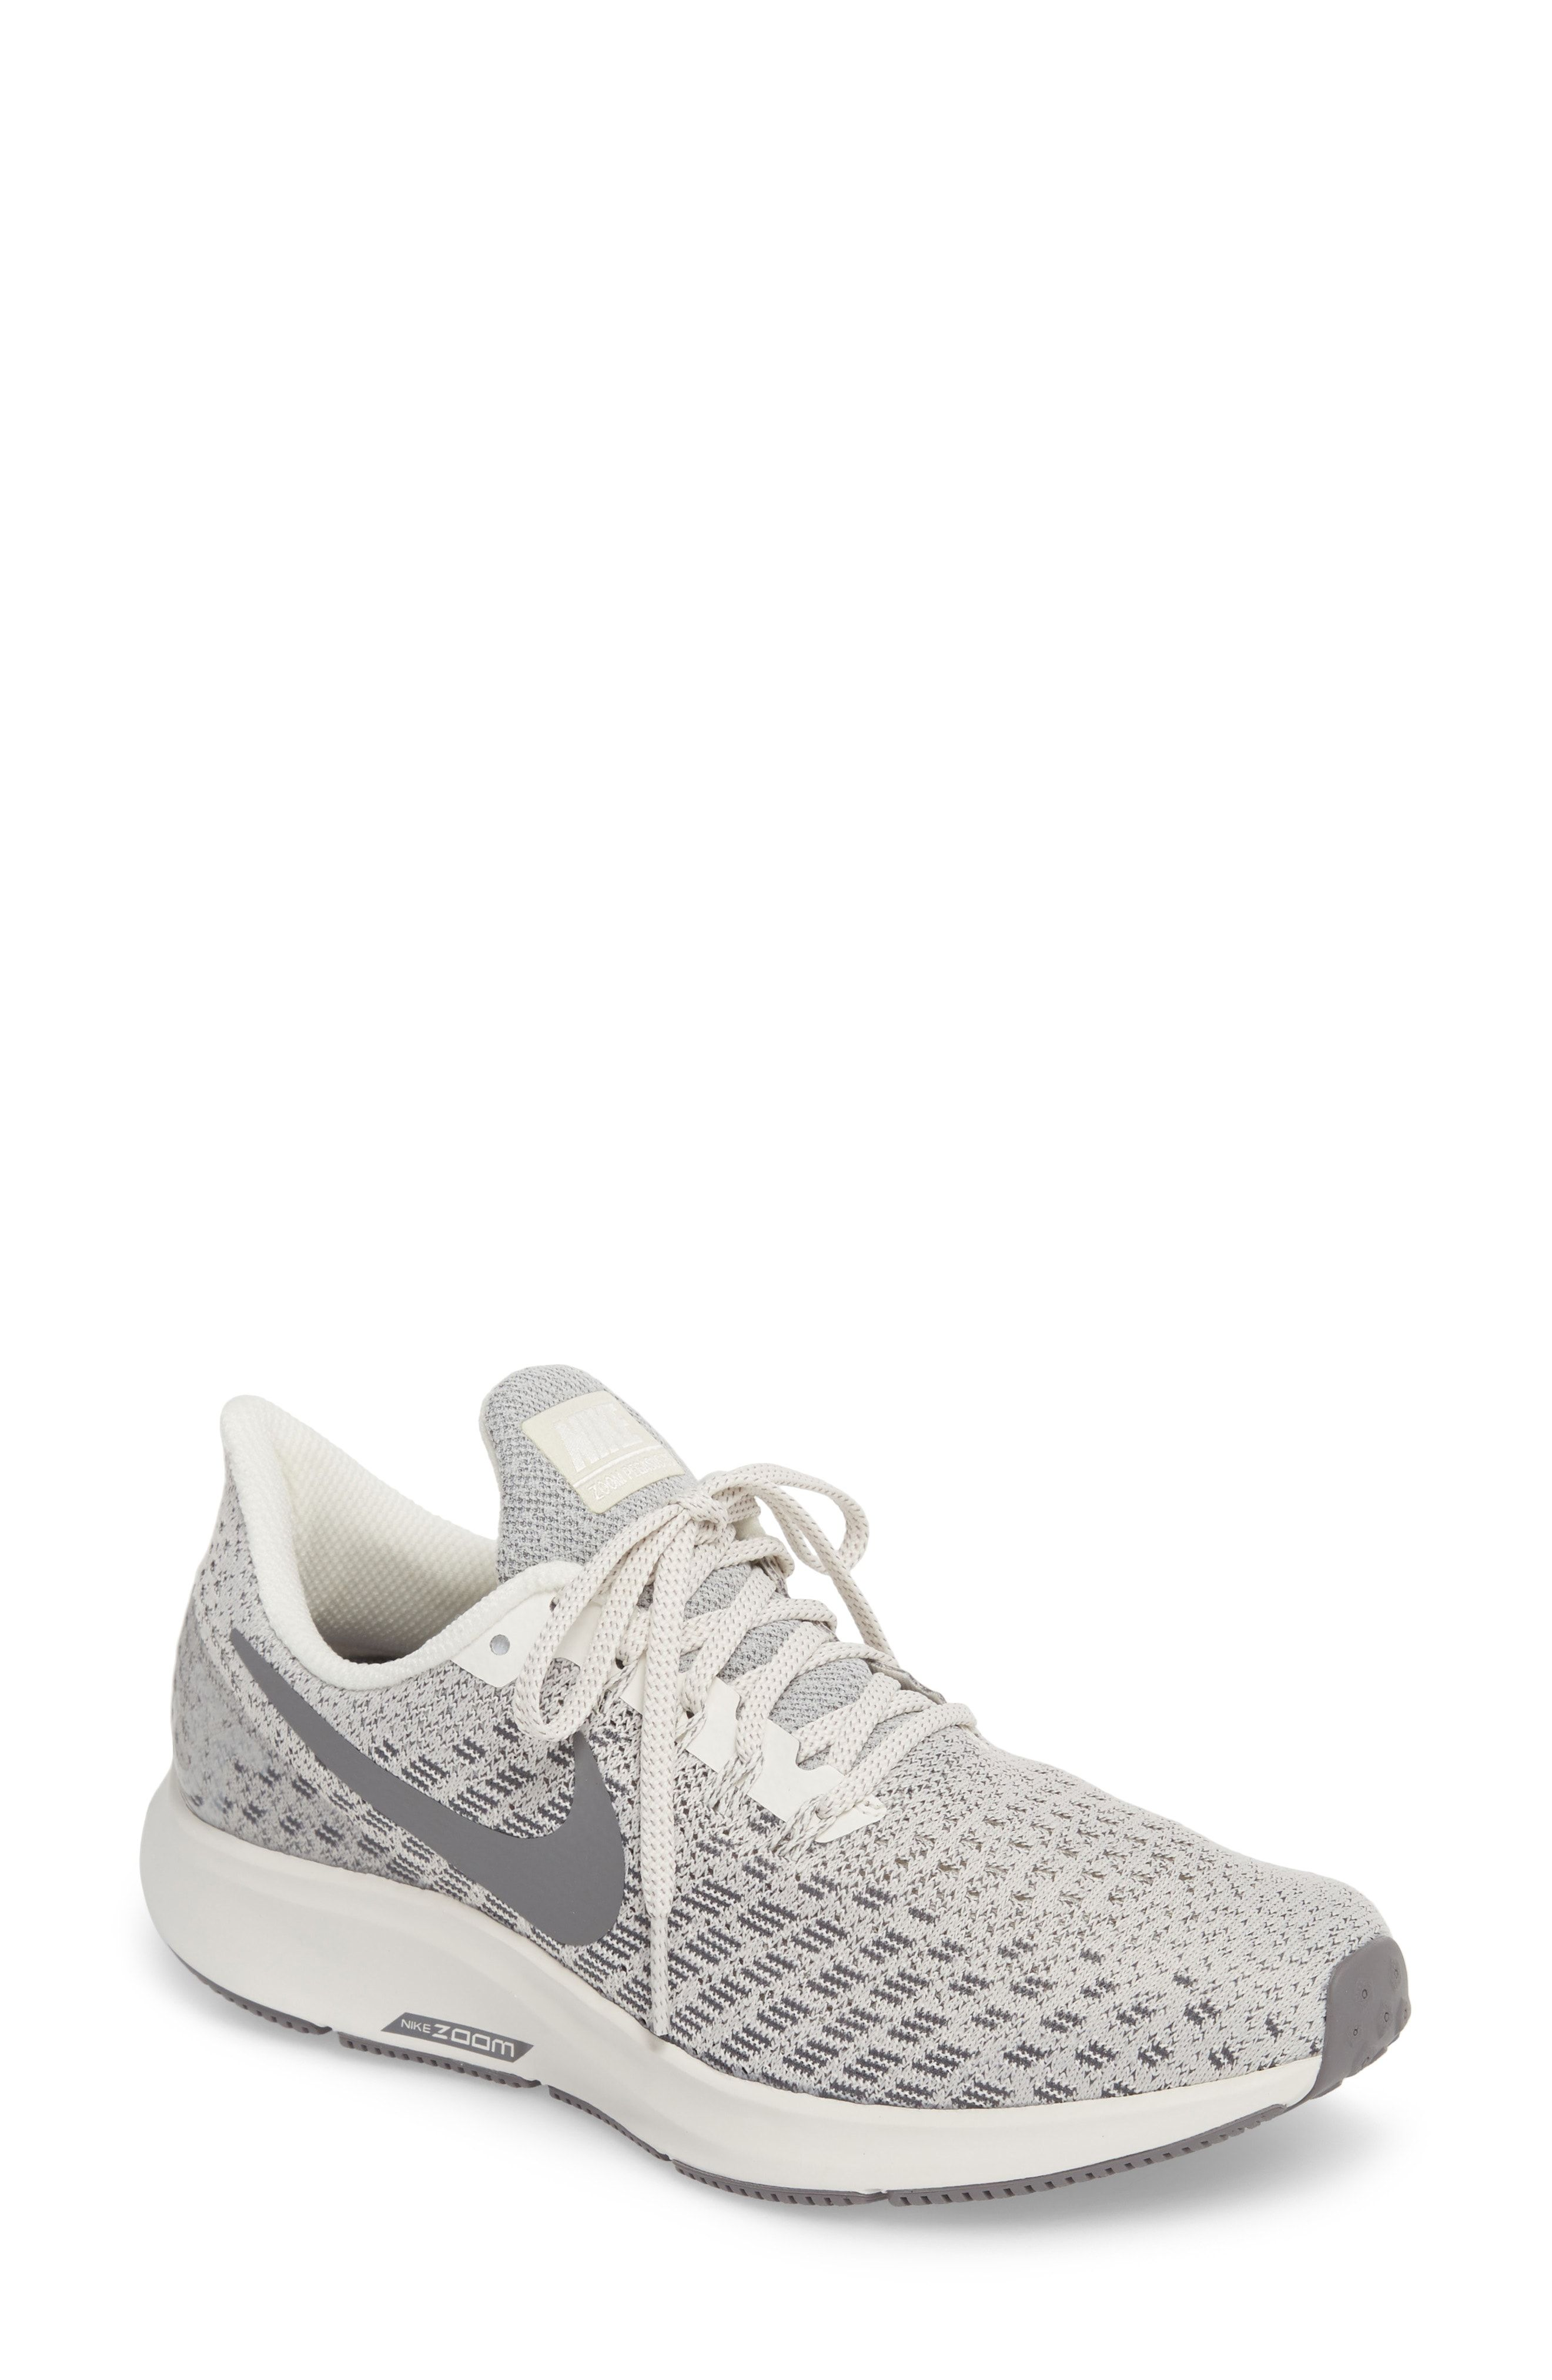 2ec28ff4218f Nike Air Zoom Pegasus 35 Running Shoe (Women)